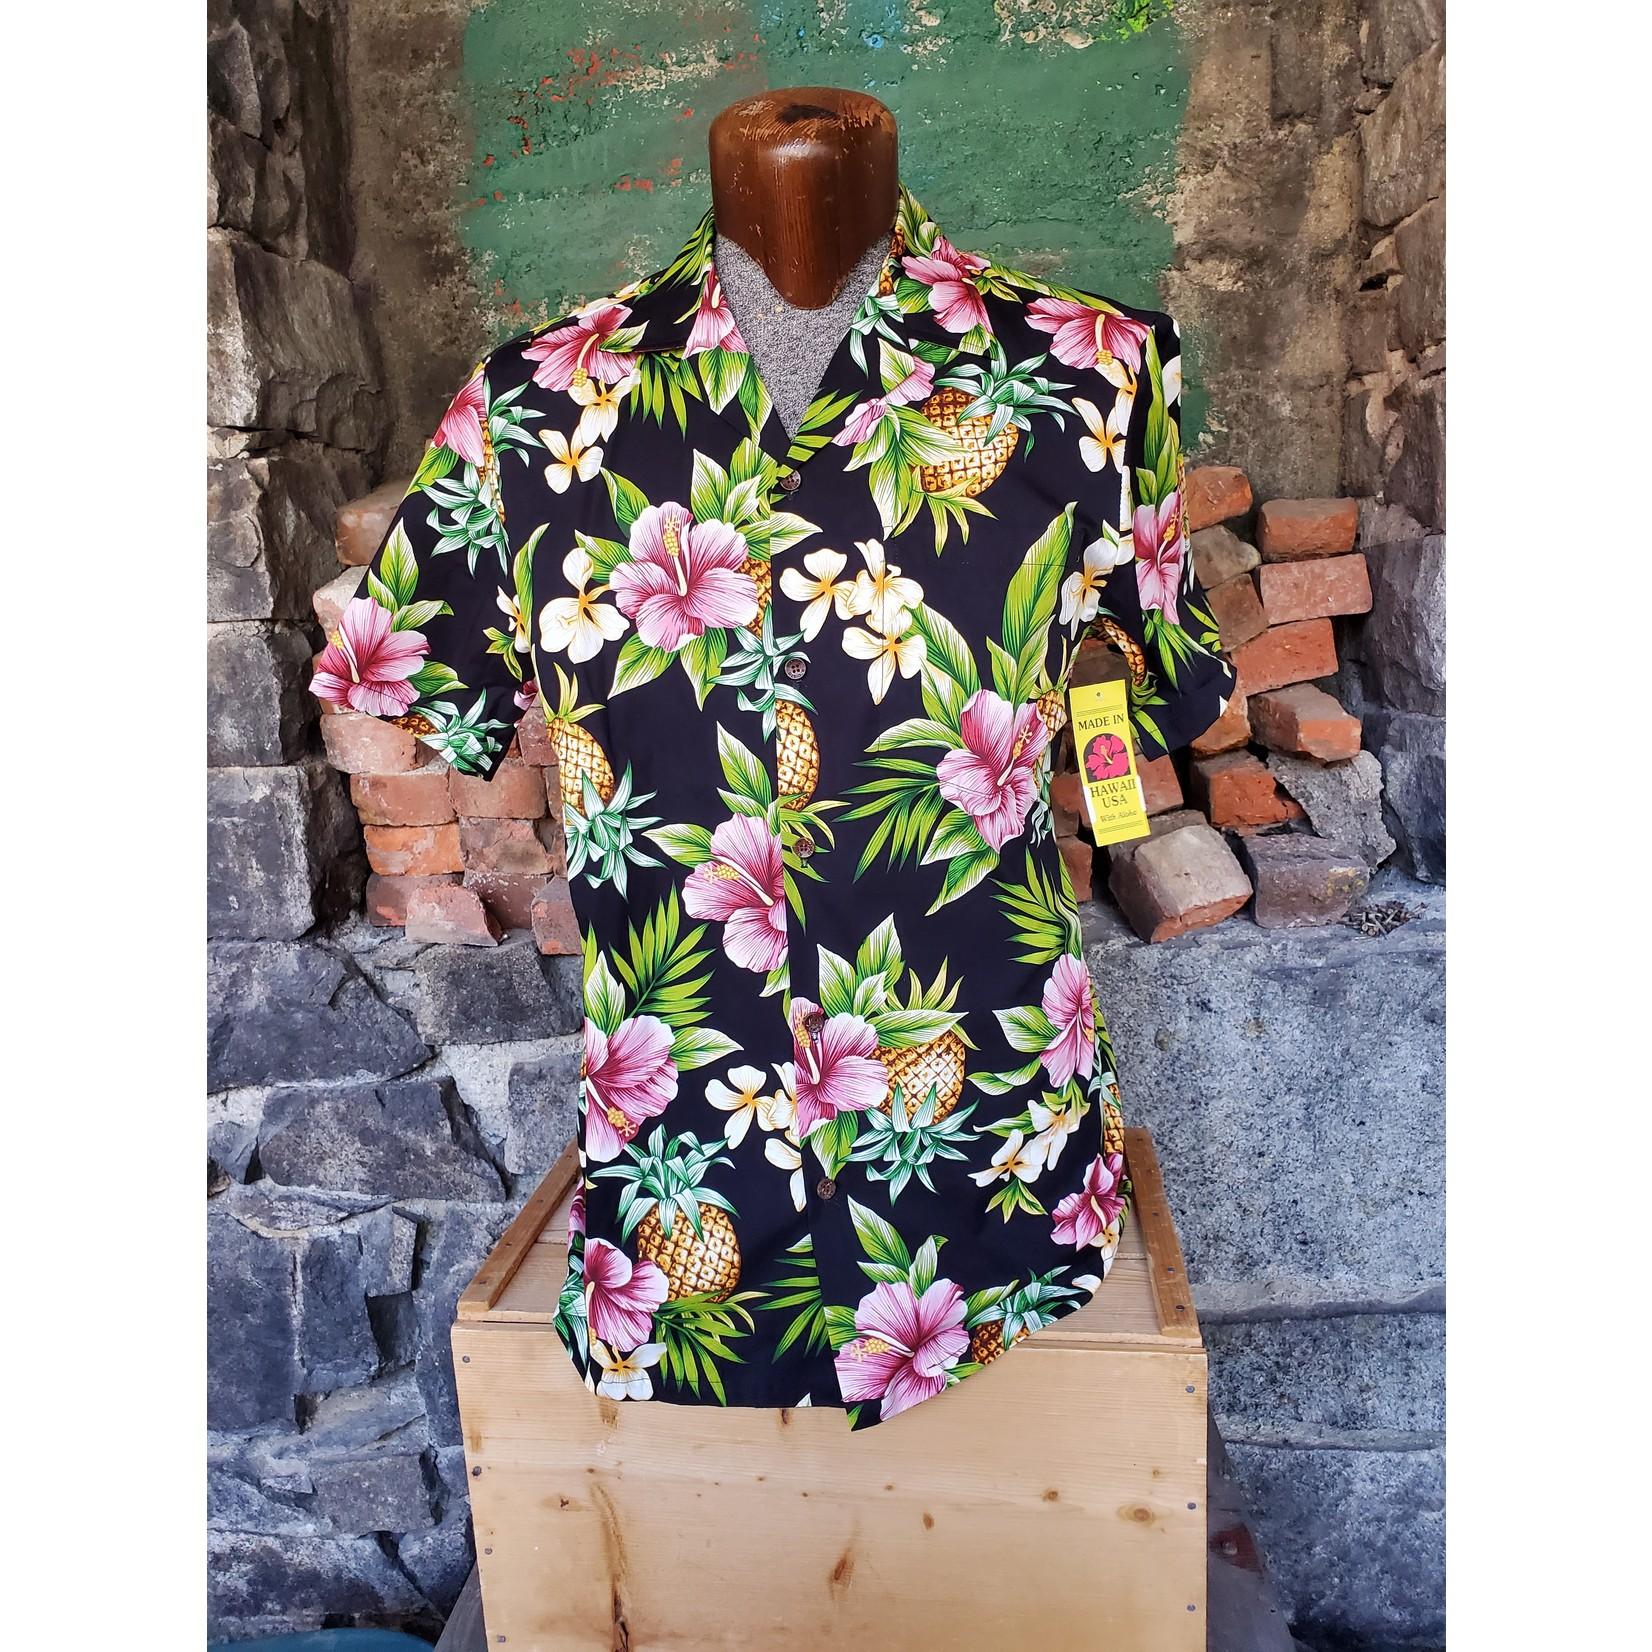 RJC Authentic Hawaiian Shirt - Black Hibiscus